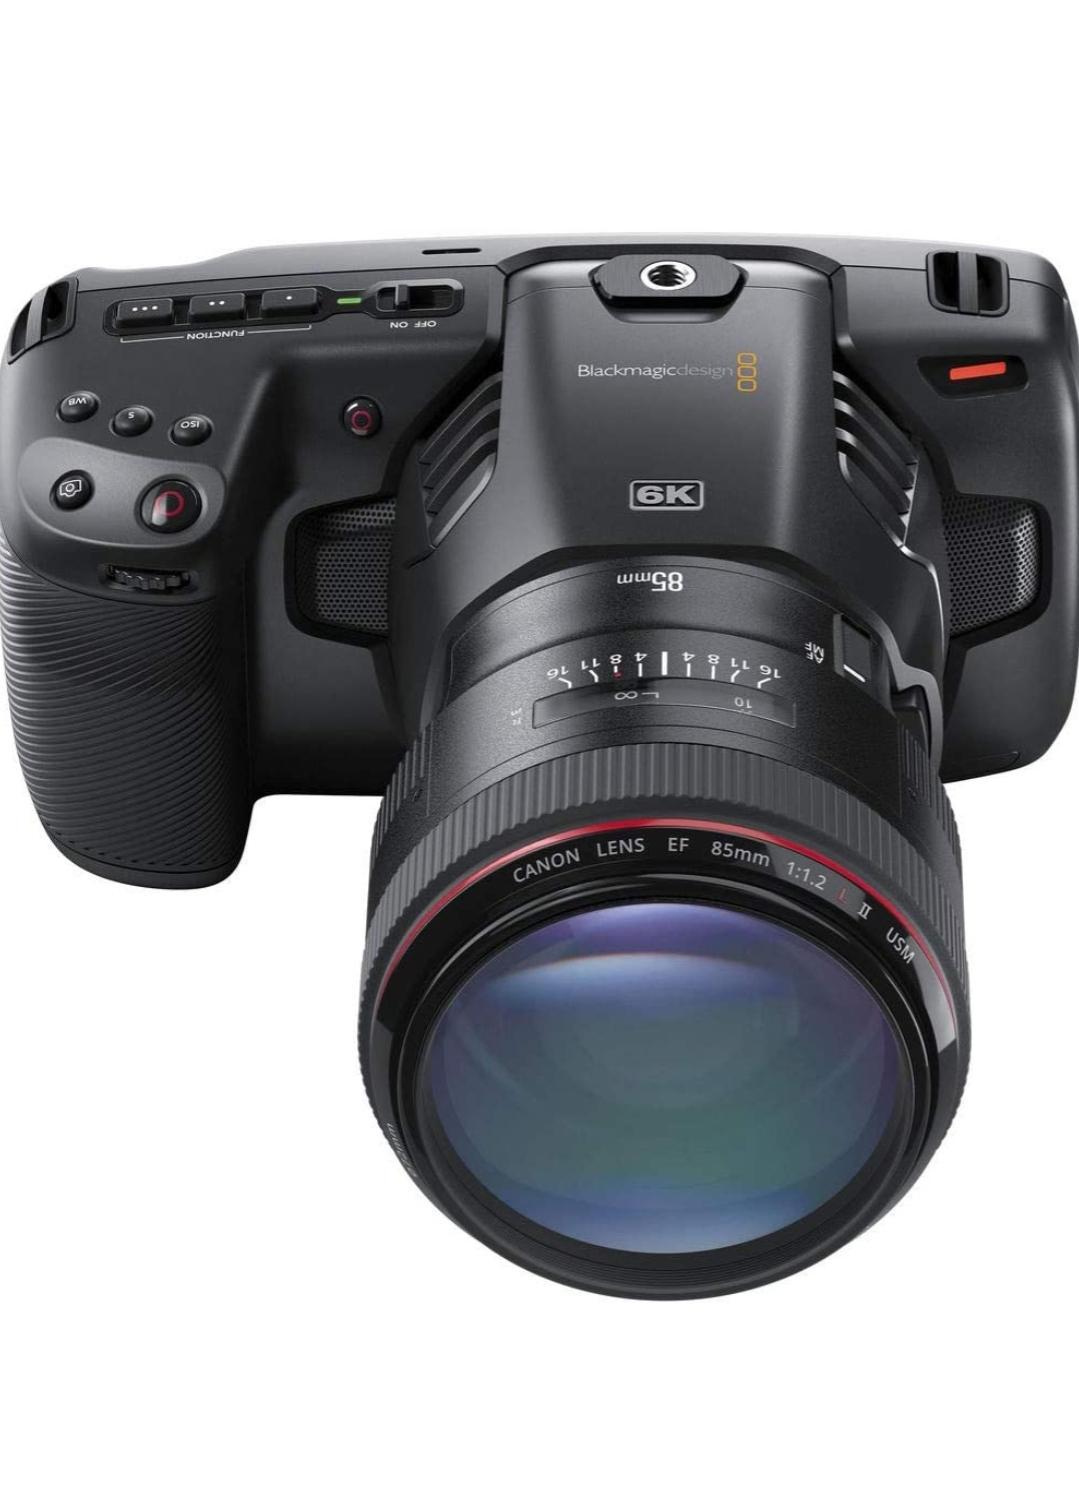 3 Blackmagic Design 6k Pocket Cinema Cameras